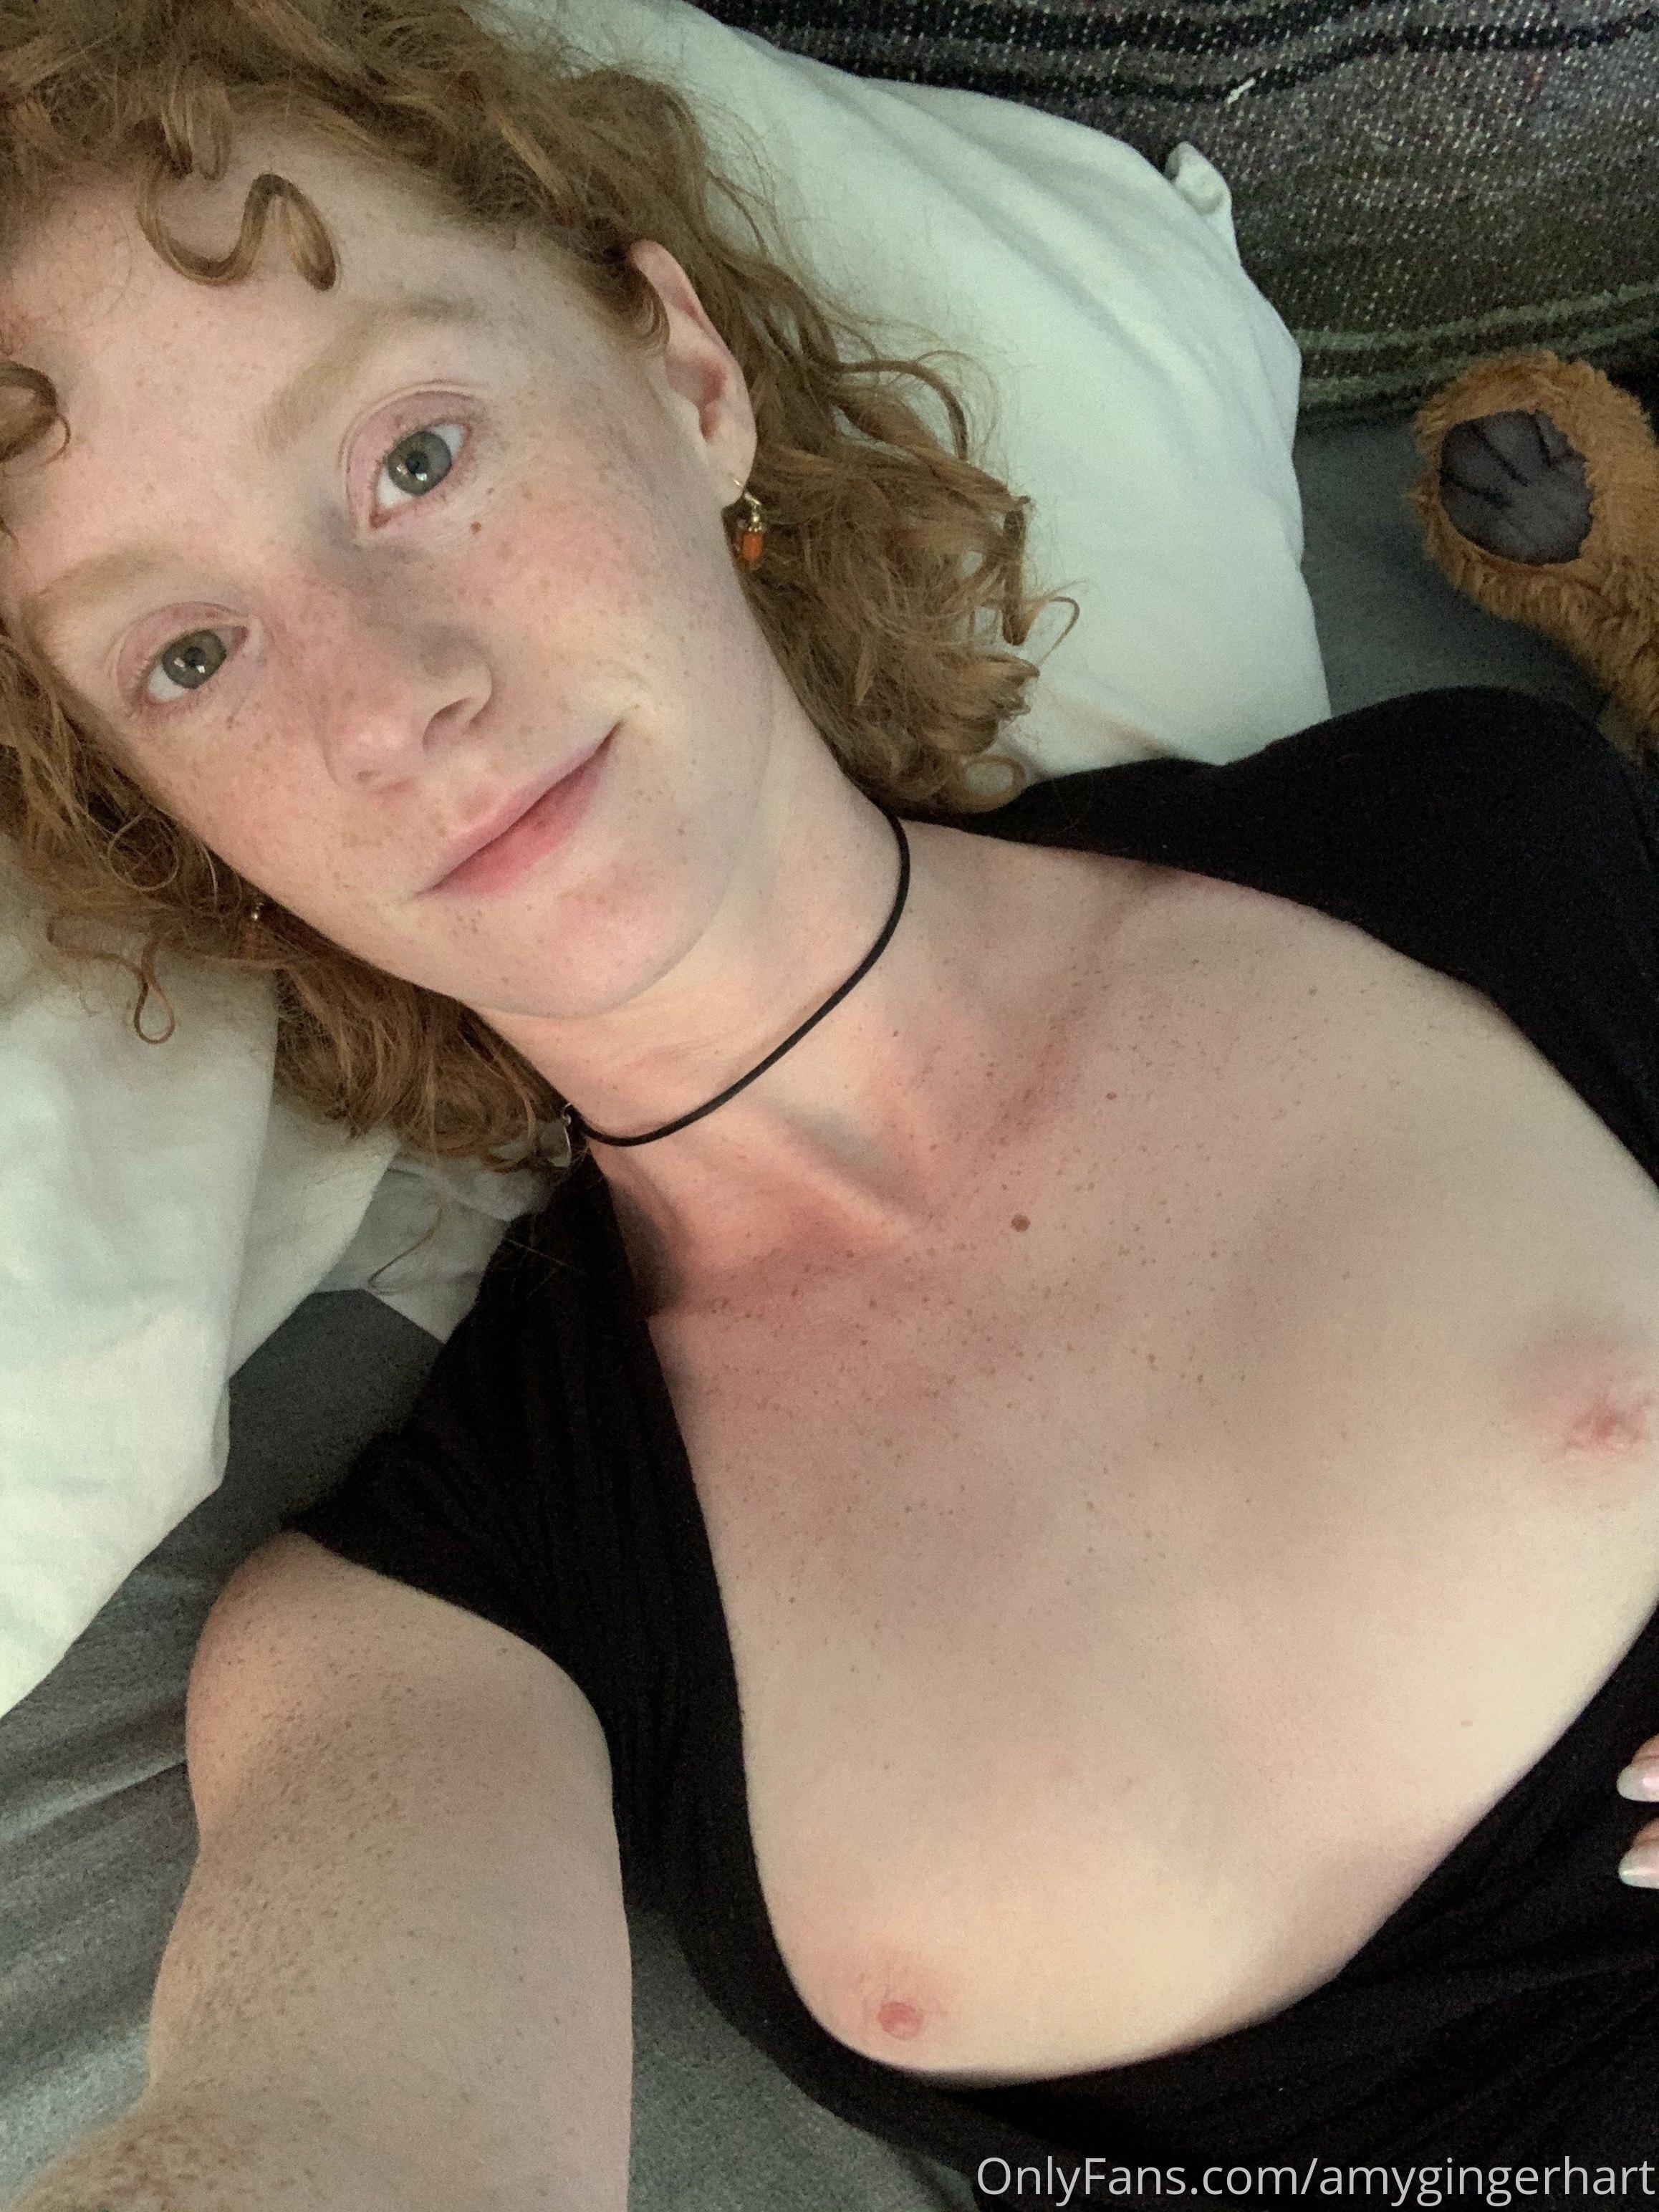 Amy Hart, Amygingerhart, Onlyfans 0336